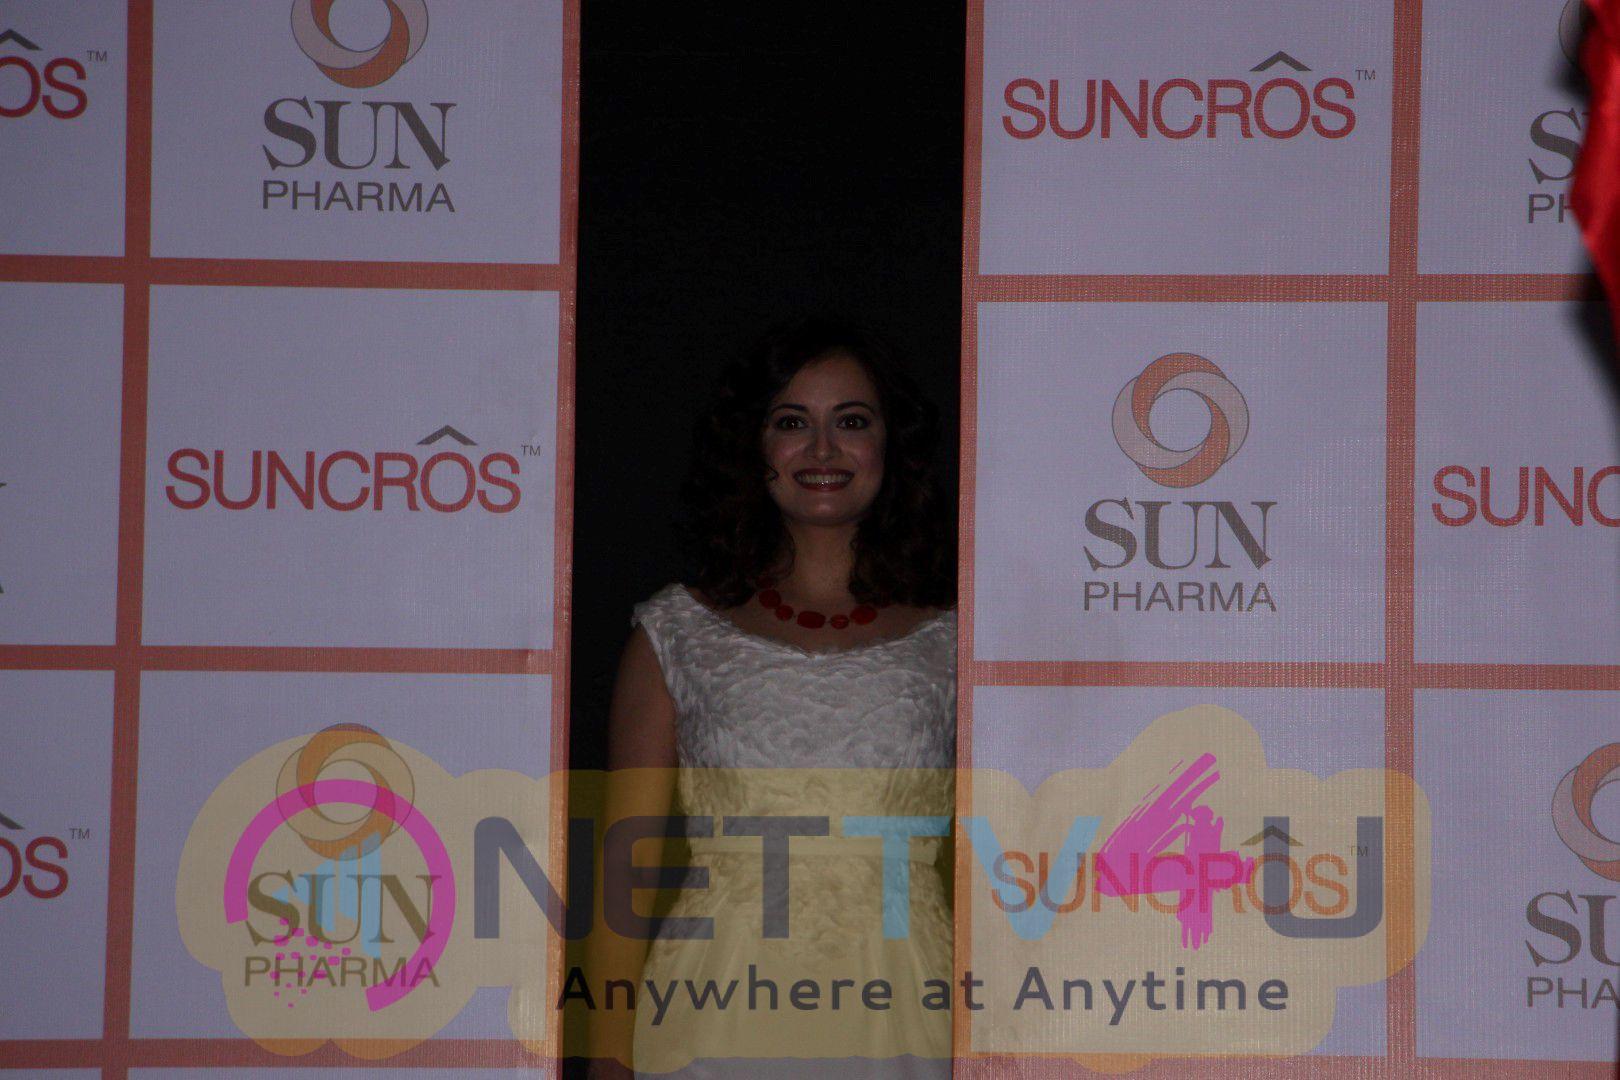 Sun Pharma Strategic Business Announcement With Dia Mirza Delightful Photos